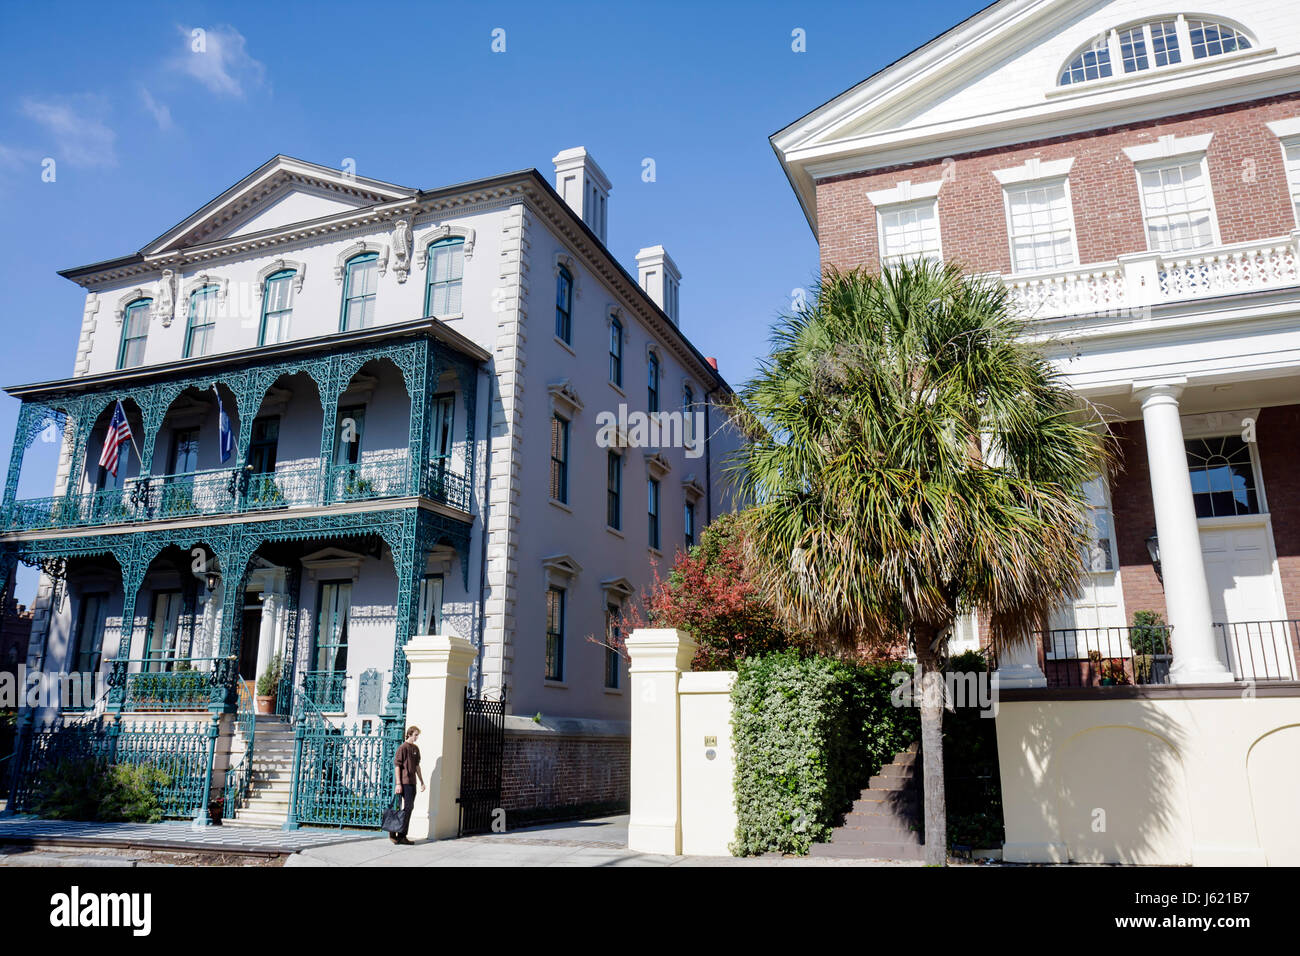 Charleston South Carolina Southern National Historic Landmark Historic District Broad Street John Rutledge House - Stock Image